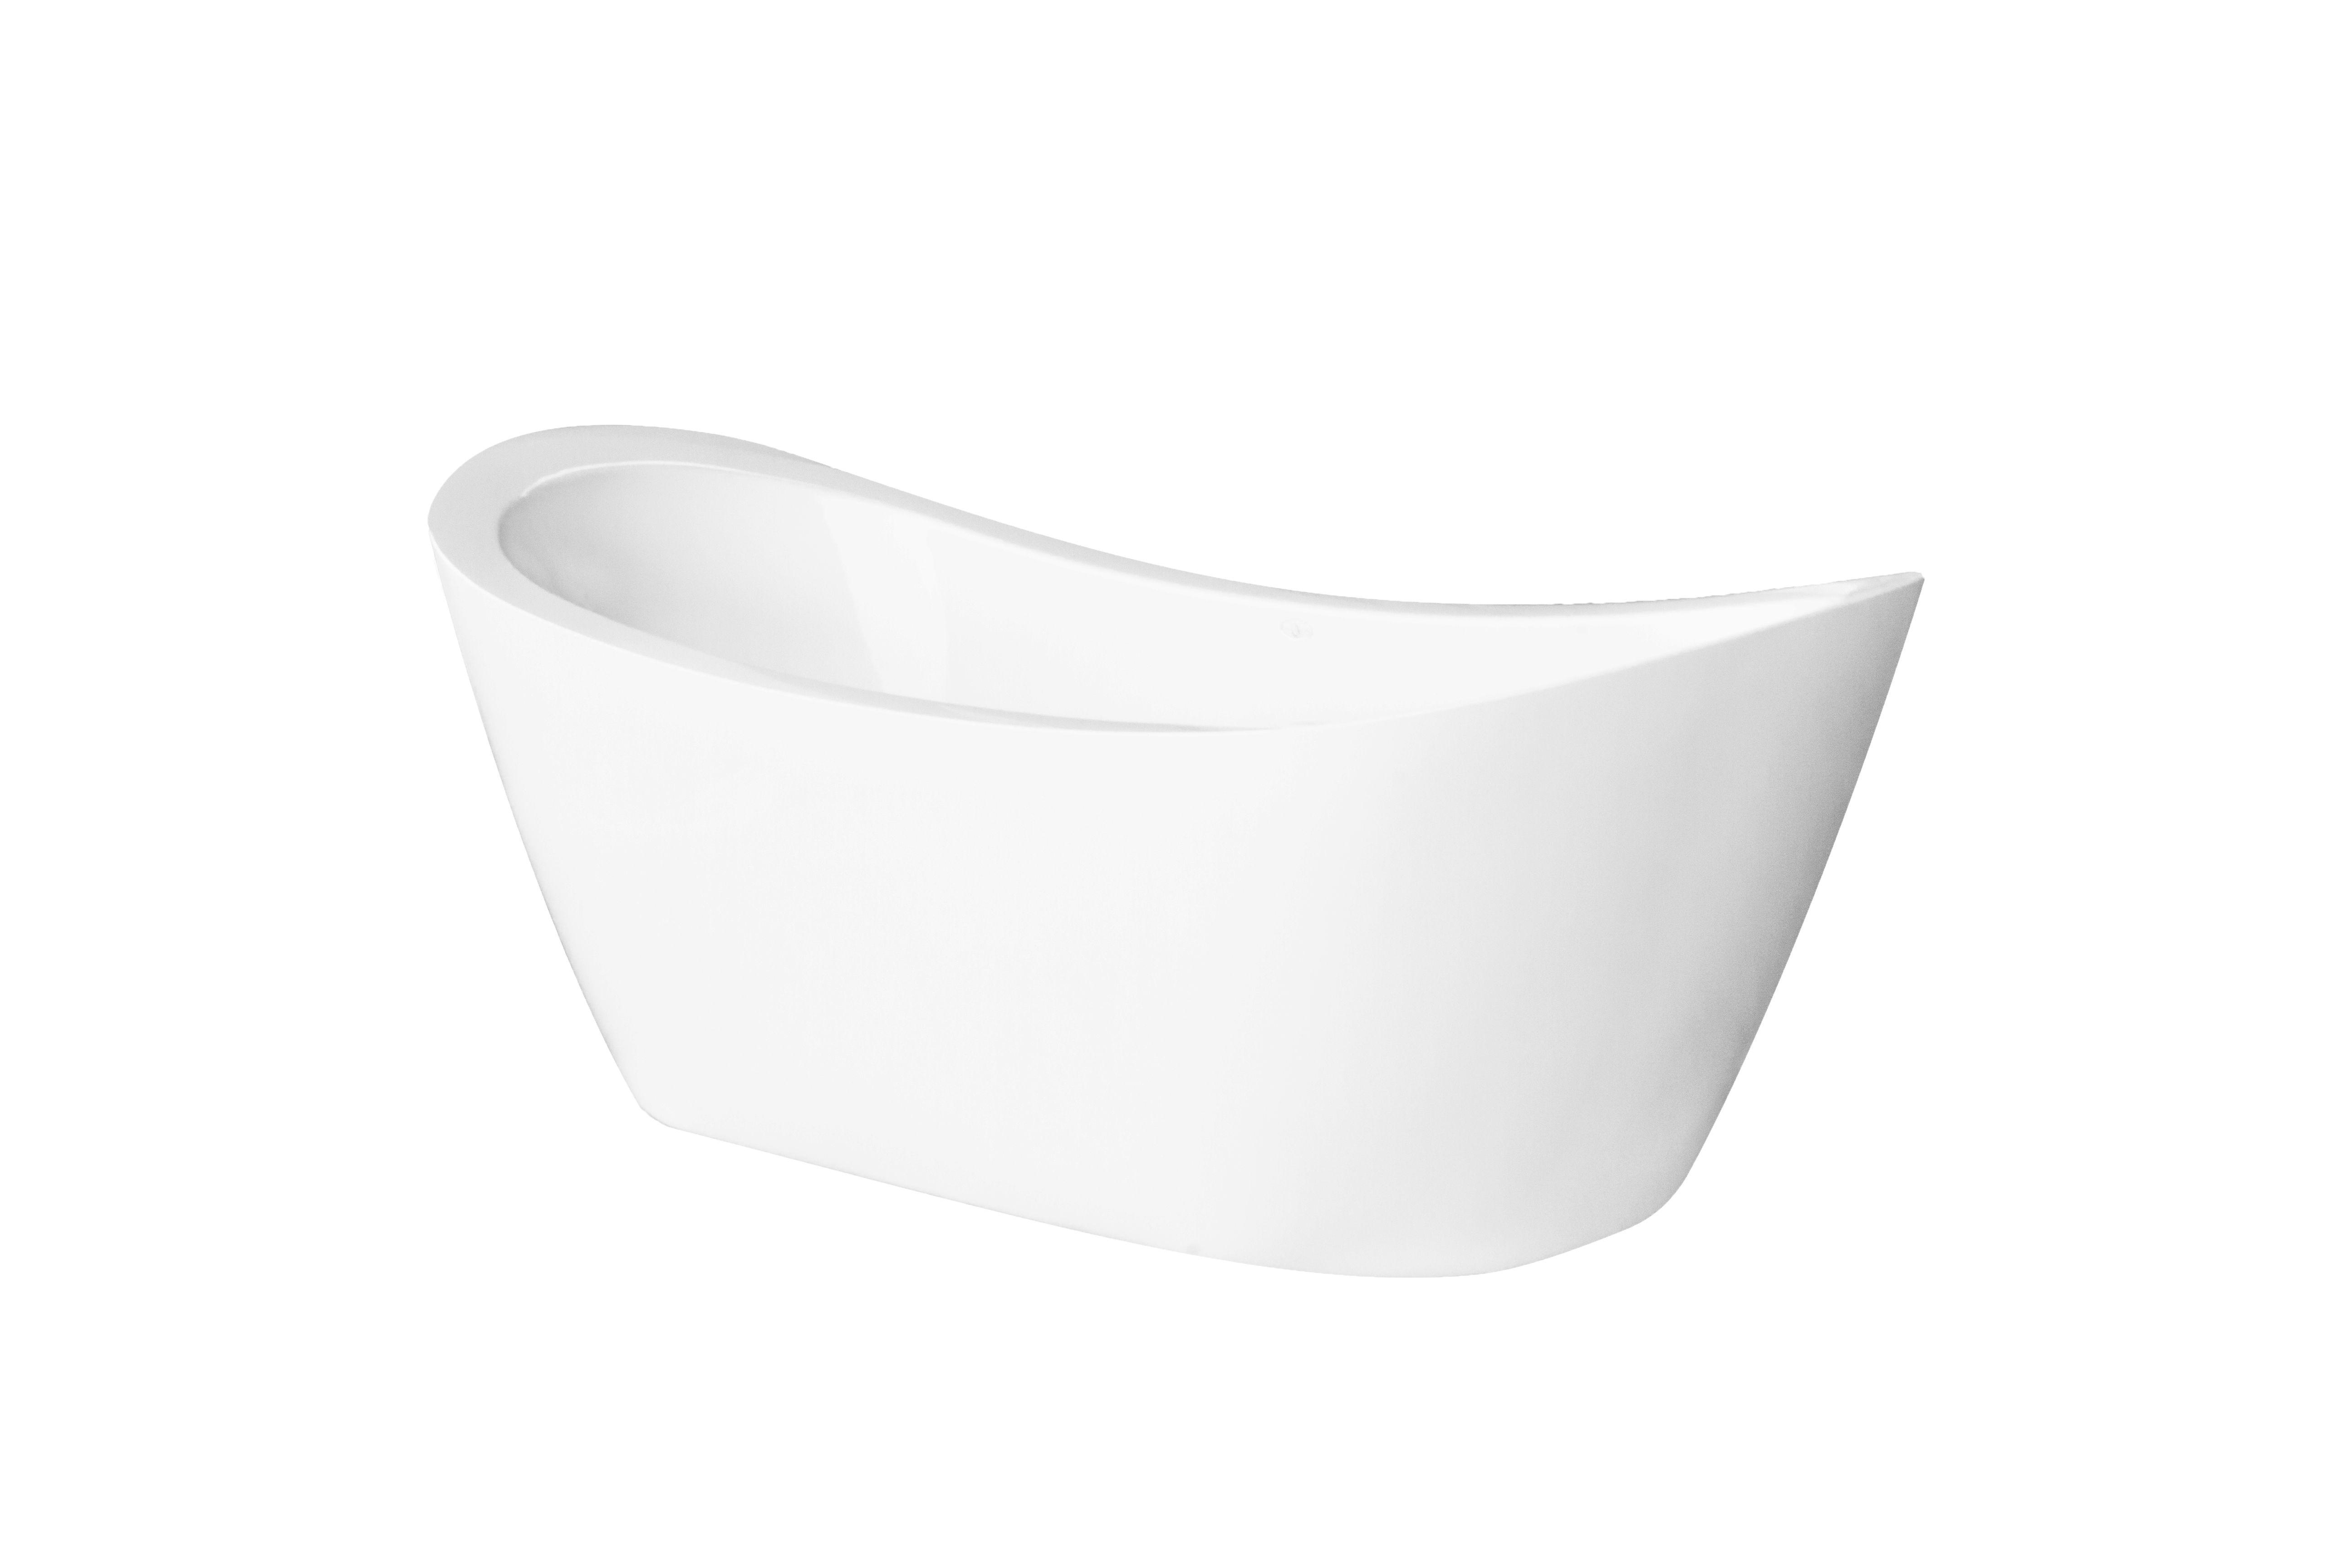 Modern, freestanding bathtub by Jetta Corporation. J62 Eclipse model ...